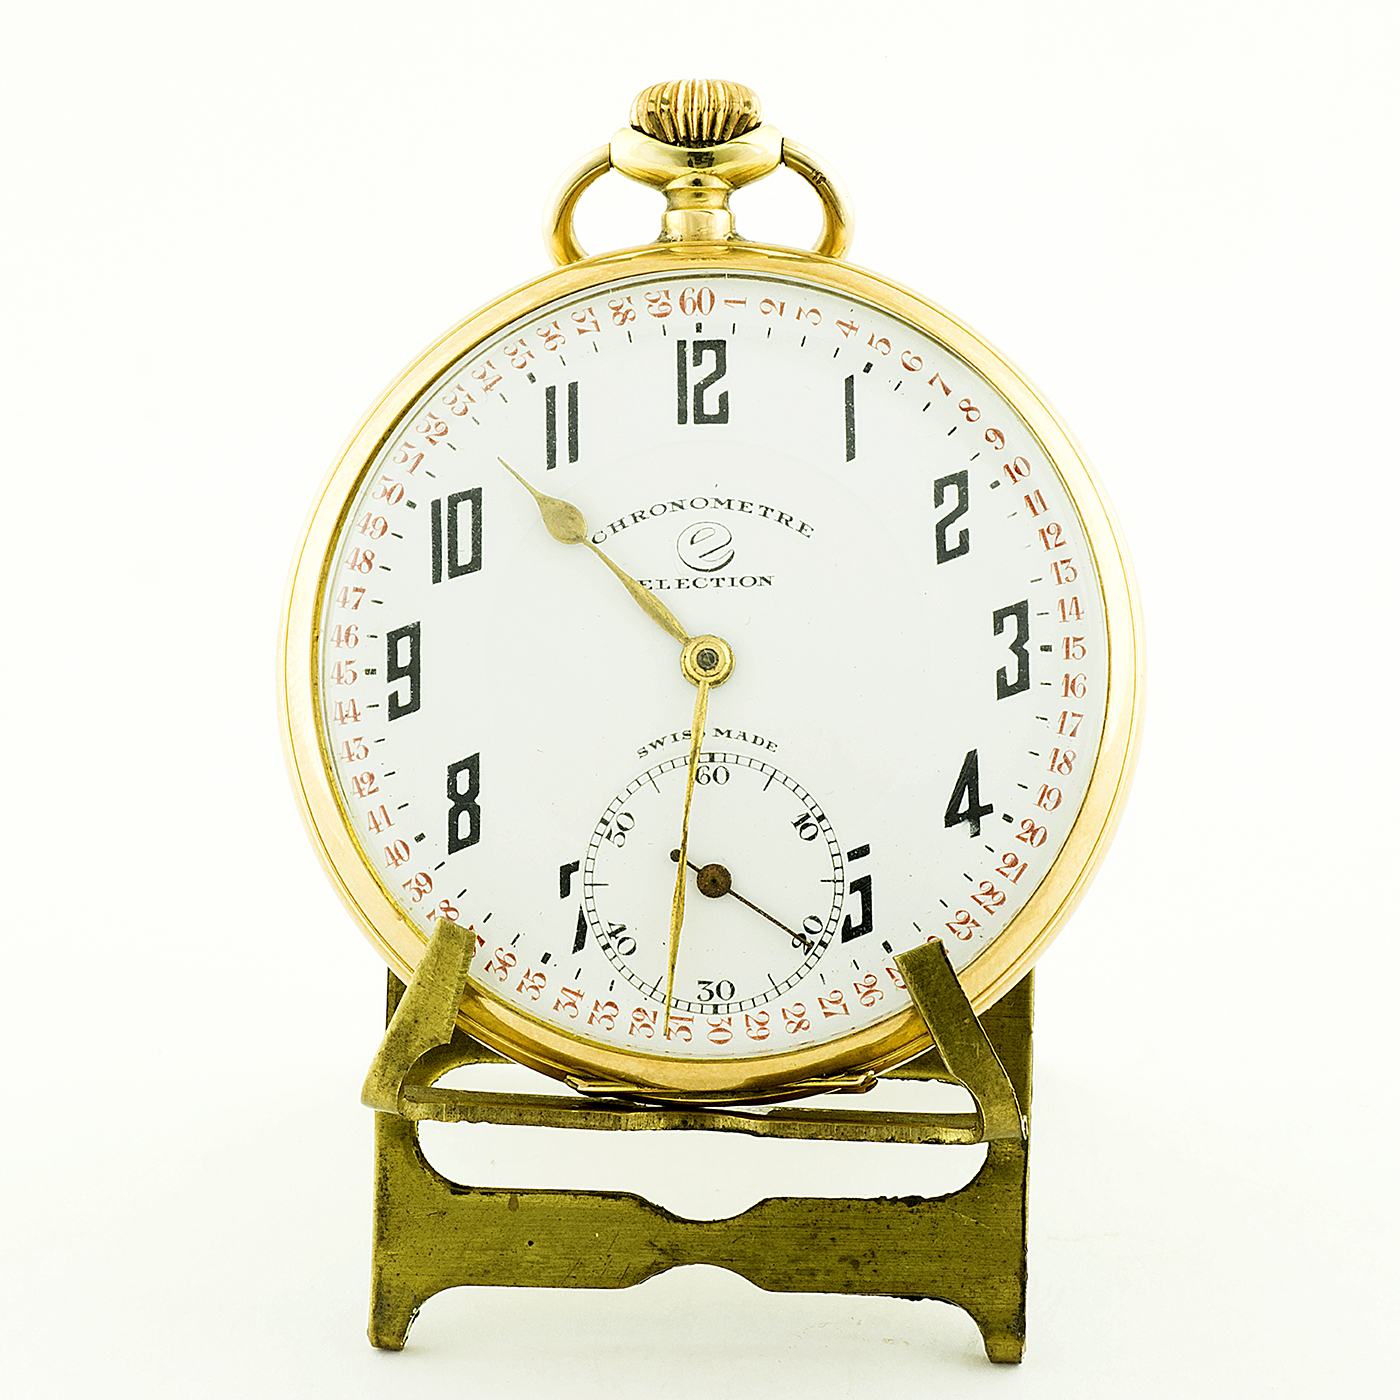 ELECTION. Reloj de bolsillo, lepine y remontoir. Suiza, ca. 1900. Oro 14k.